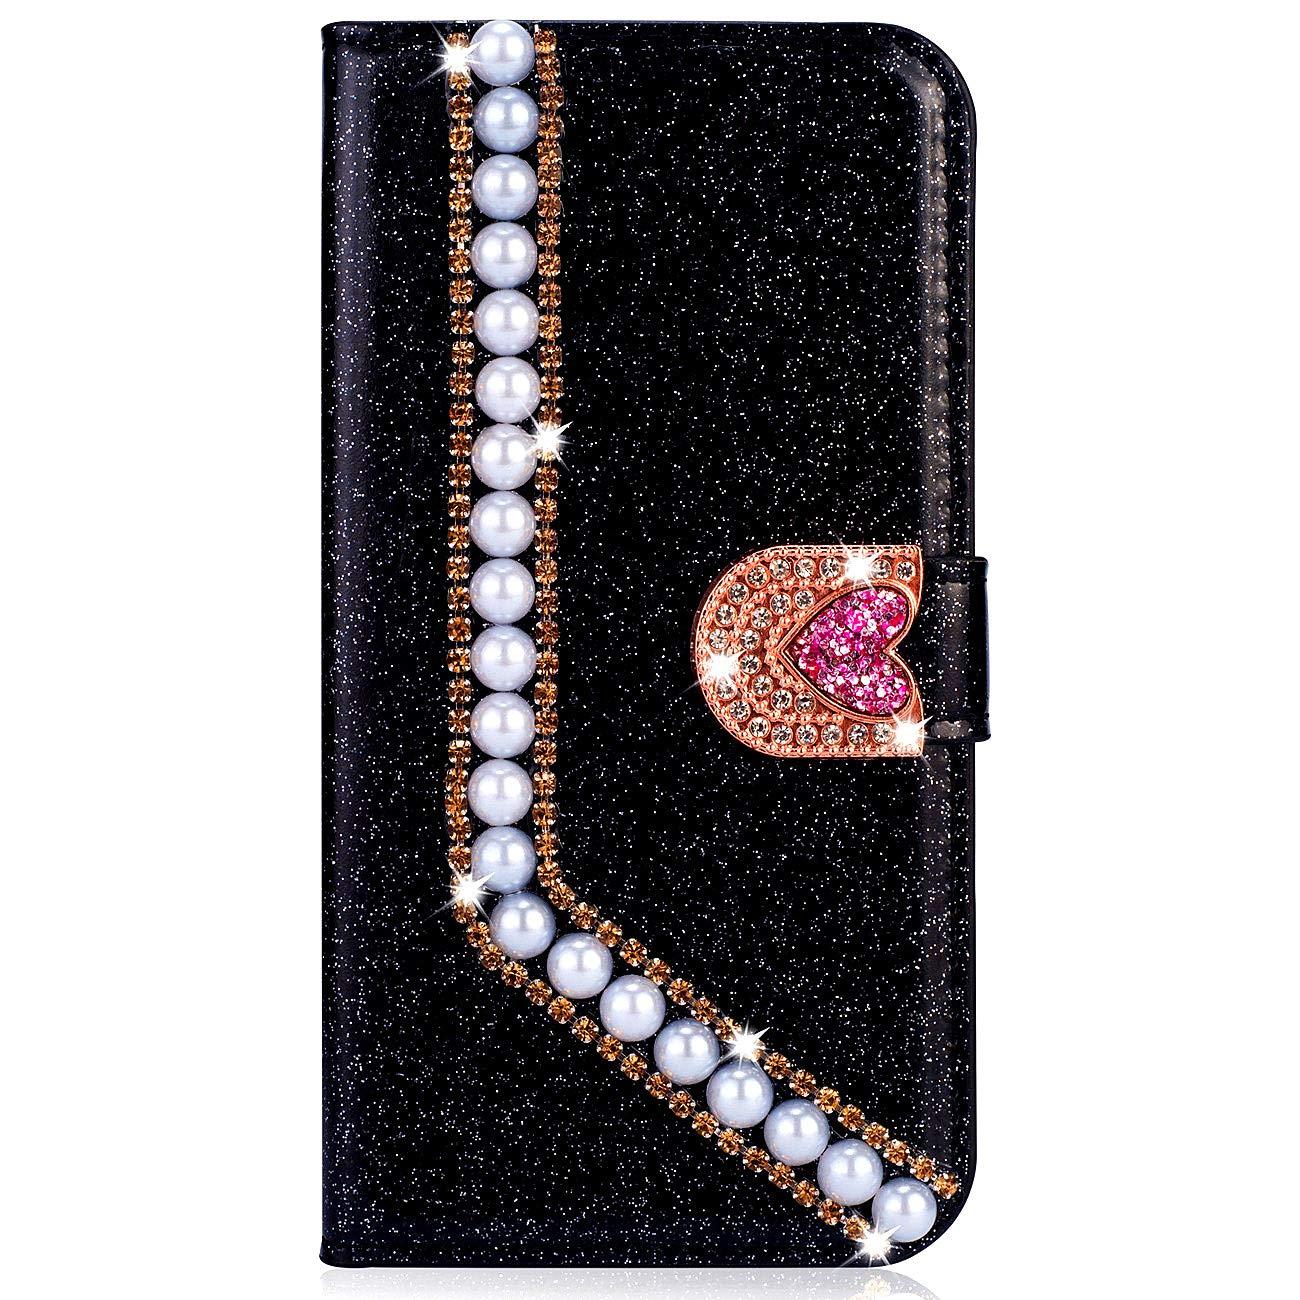 Dclbo H/ülle f/ür Huawei P8 Lite 2016//2015 Handyh/ülle Glitzer Bling Case H/ülle Leder Schutzh/ülle Gl/änzend Diamant Strass Magnet Flip Cover Lederh/ülle Handytasche f/ür Huawei P8 Lite 2016//2015-Rosa